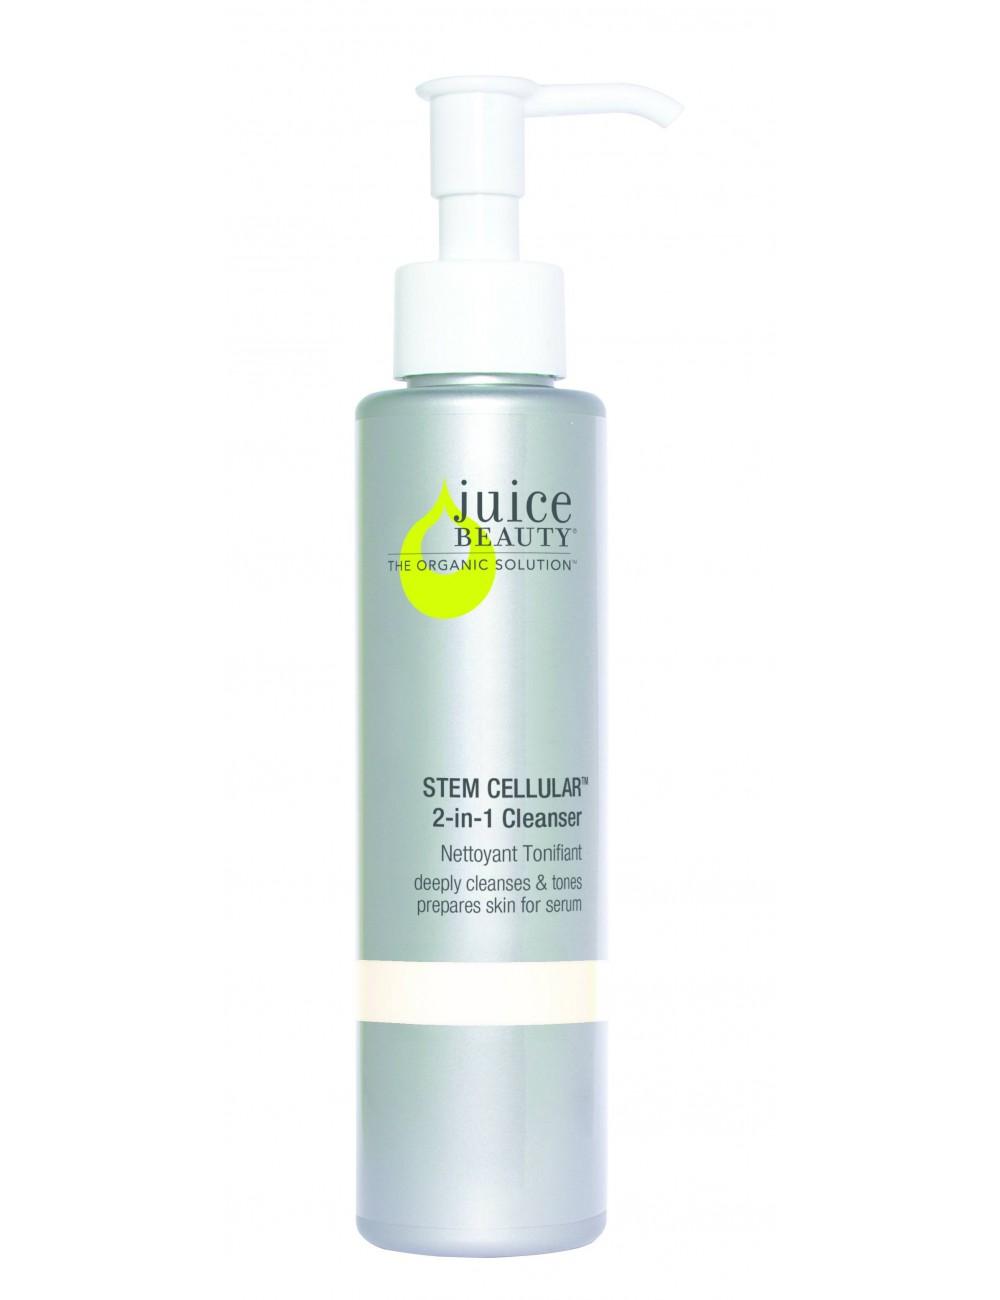 Juice Beauty Stem Cellular™ 2-in-1 Cleanser 133ml